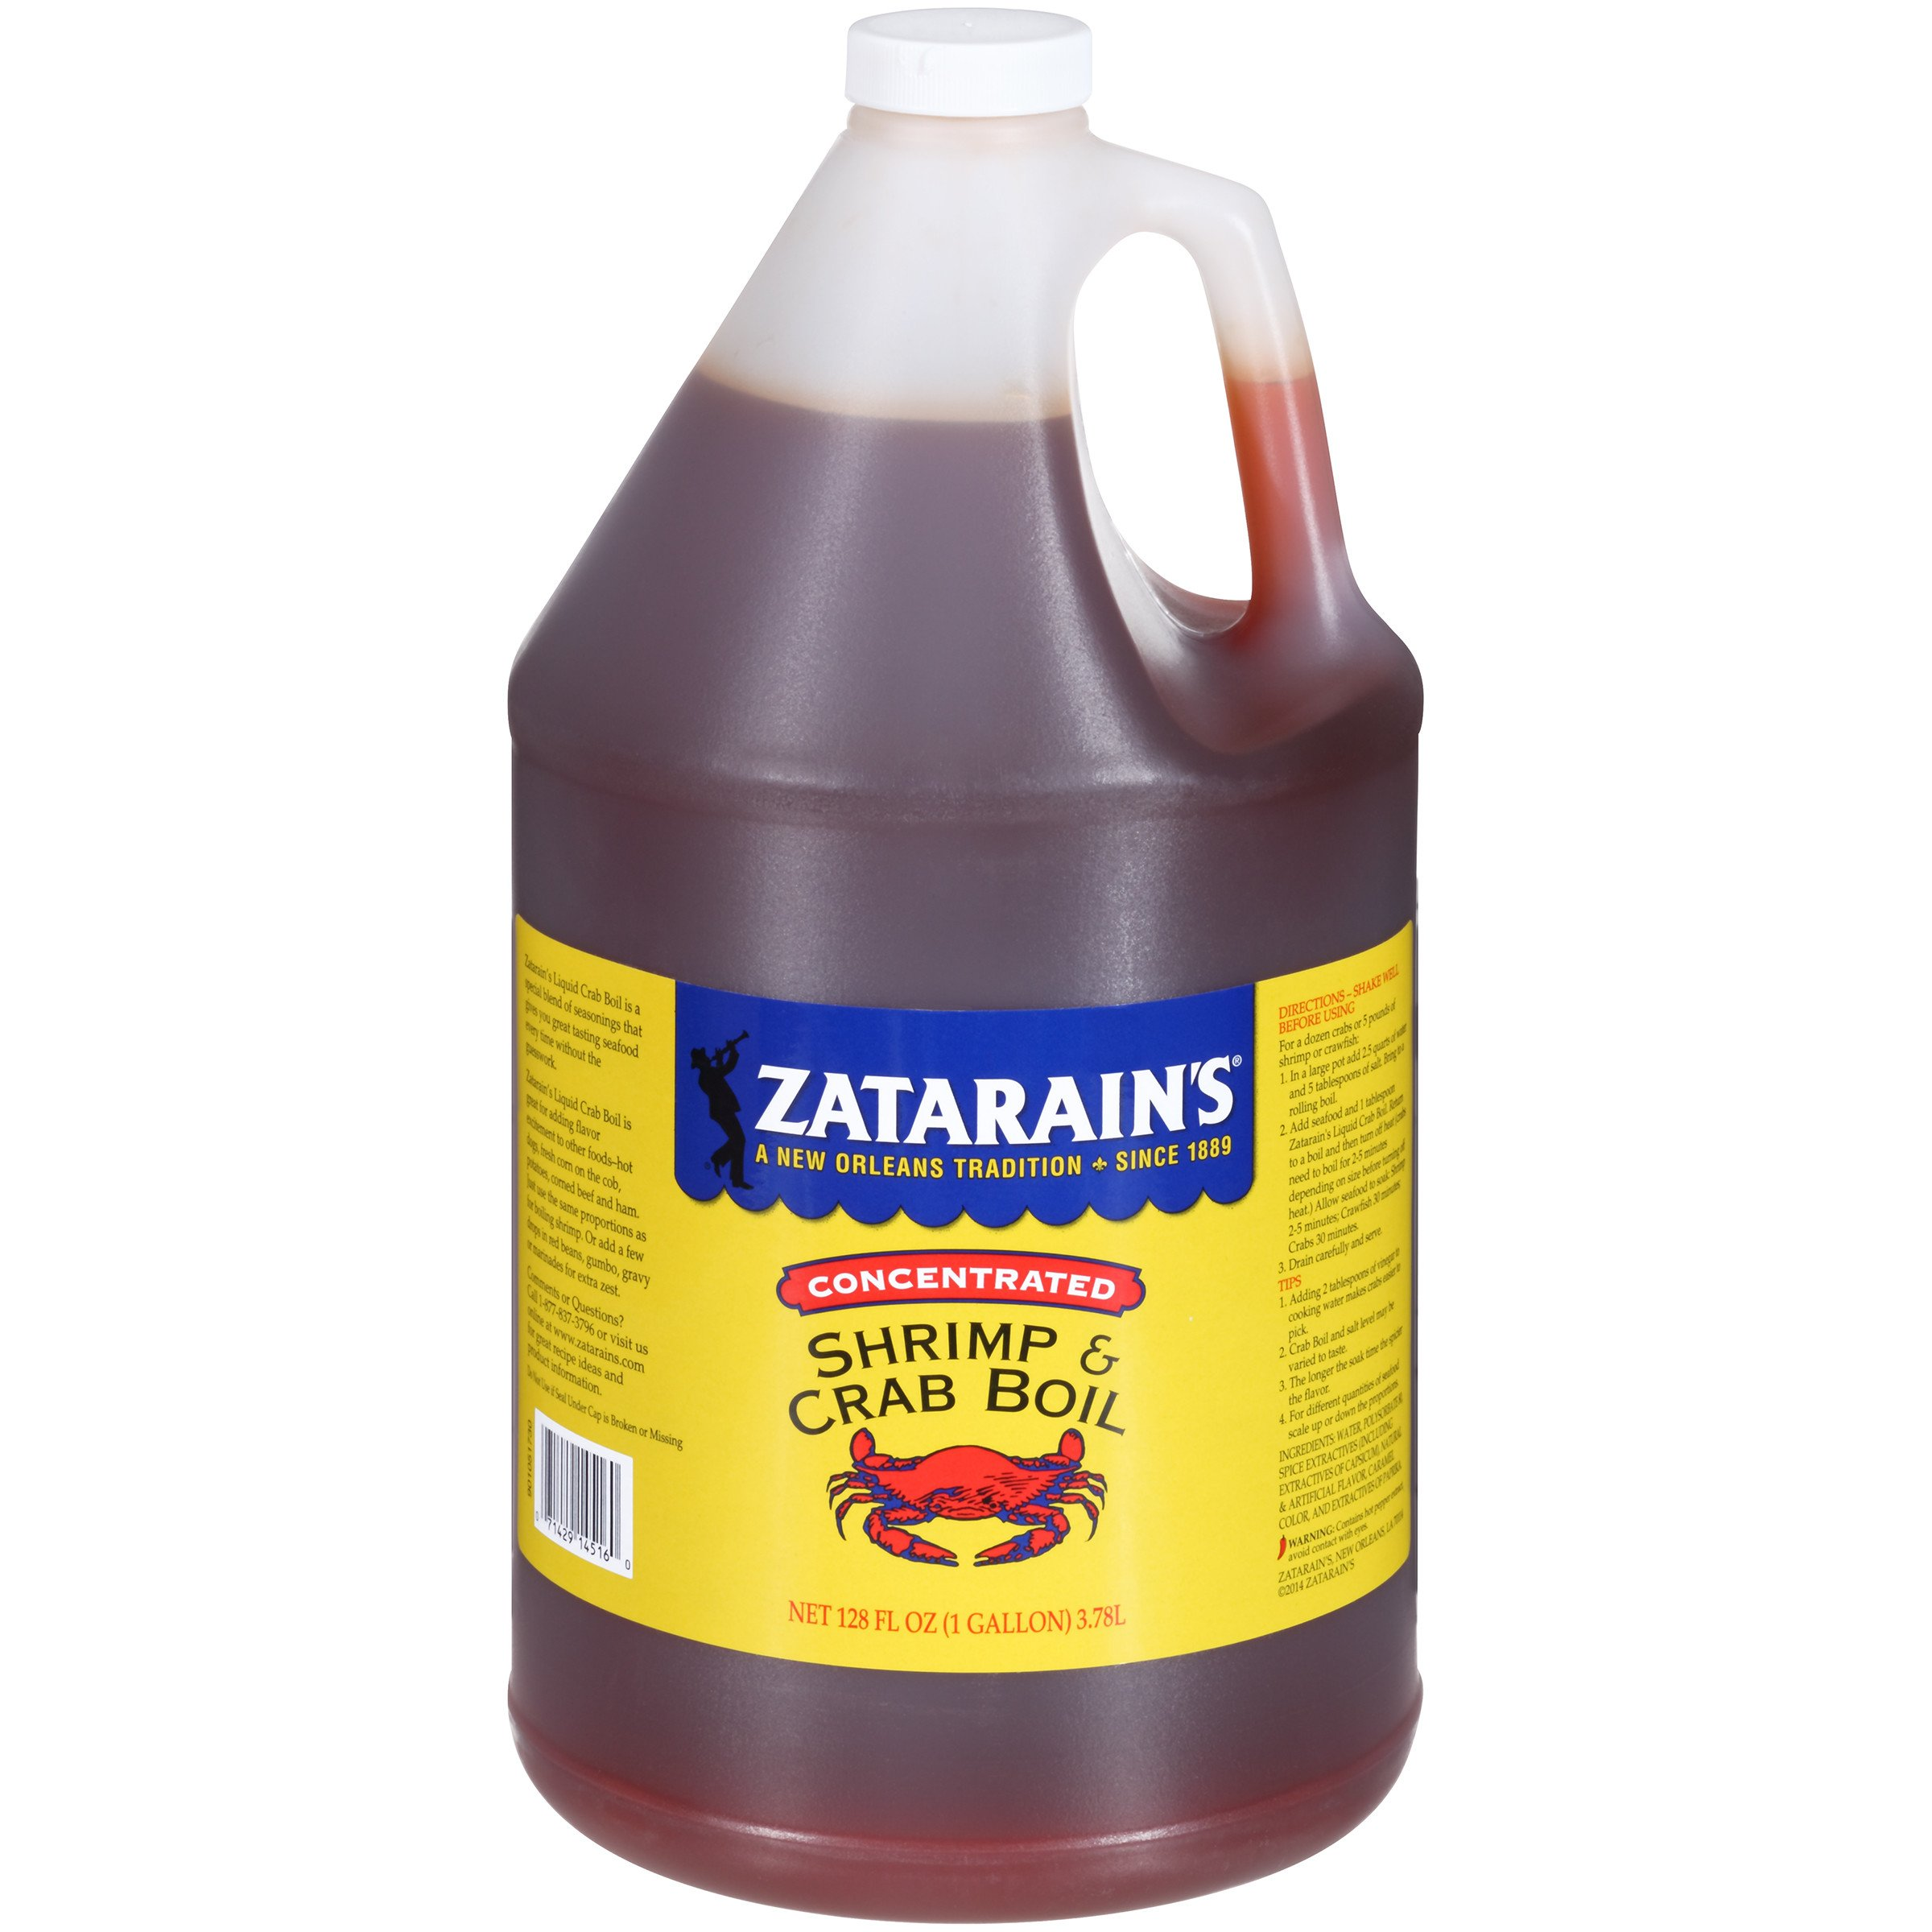 Zatarain's New Orleans Style Crawfish, Shrimp & Crab Boil, 128 fl oz